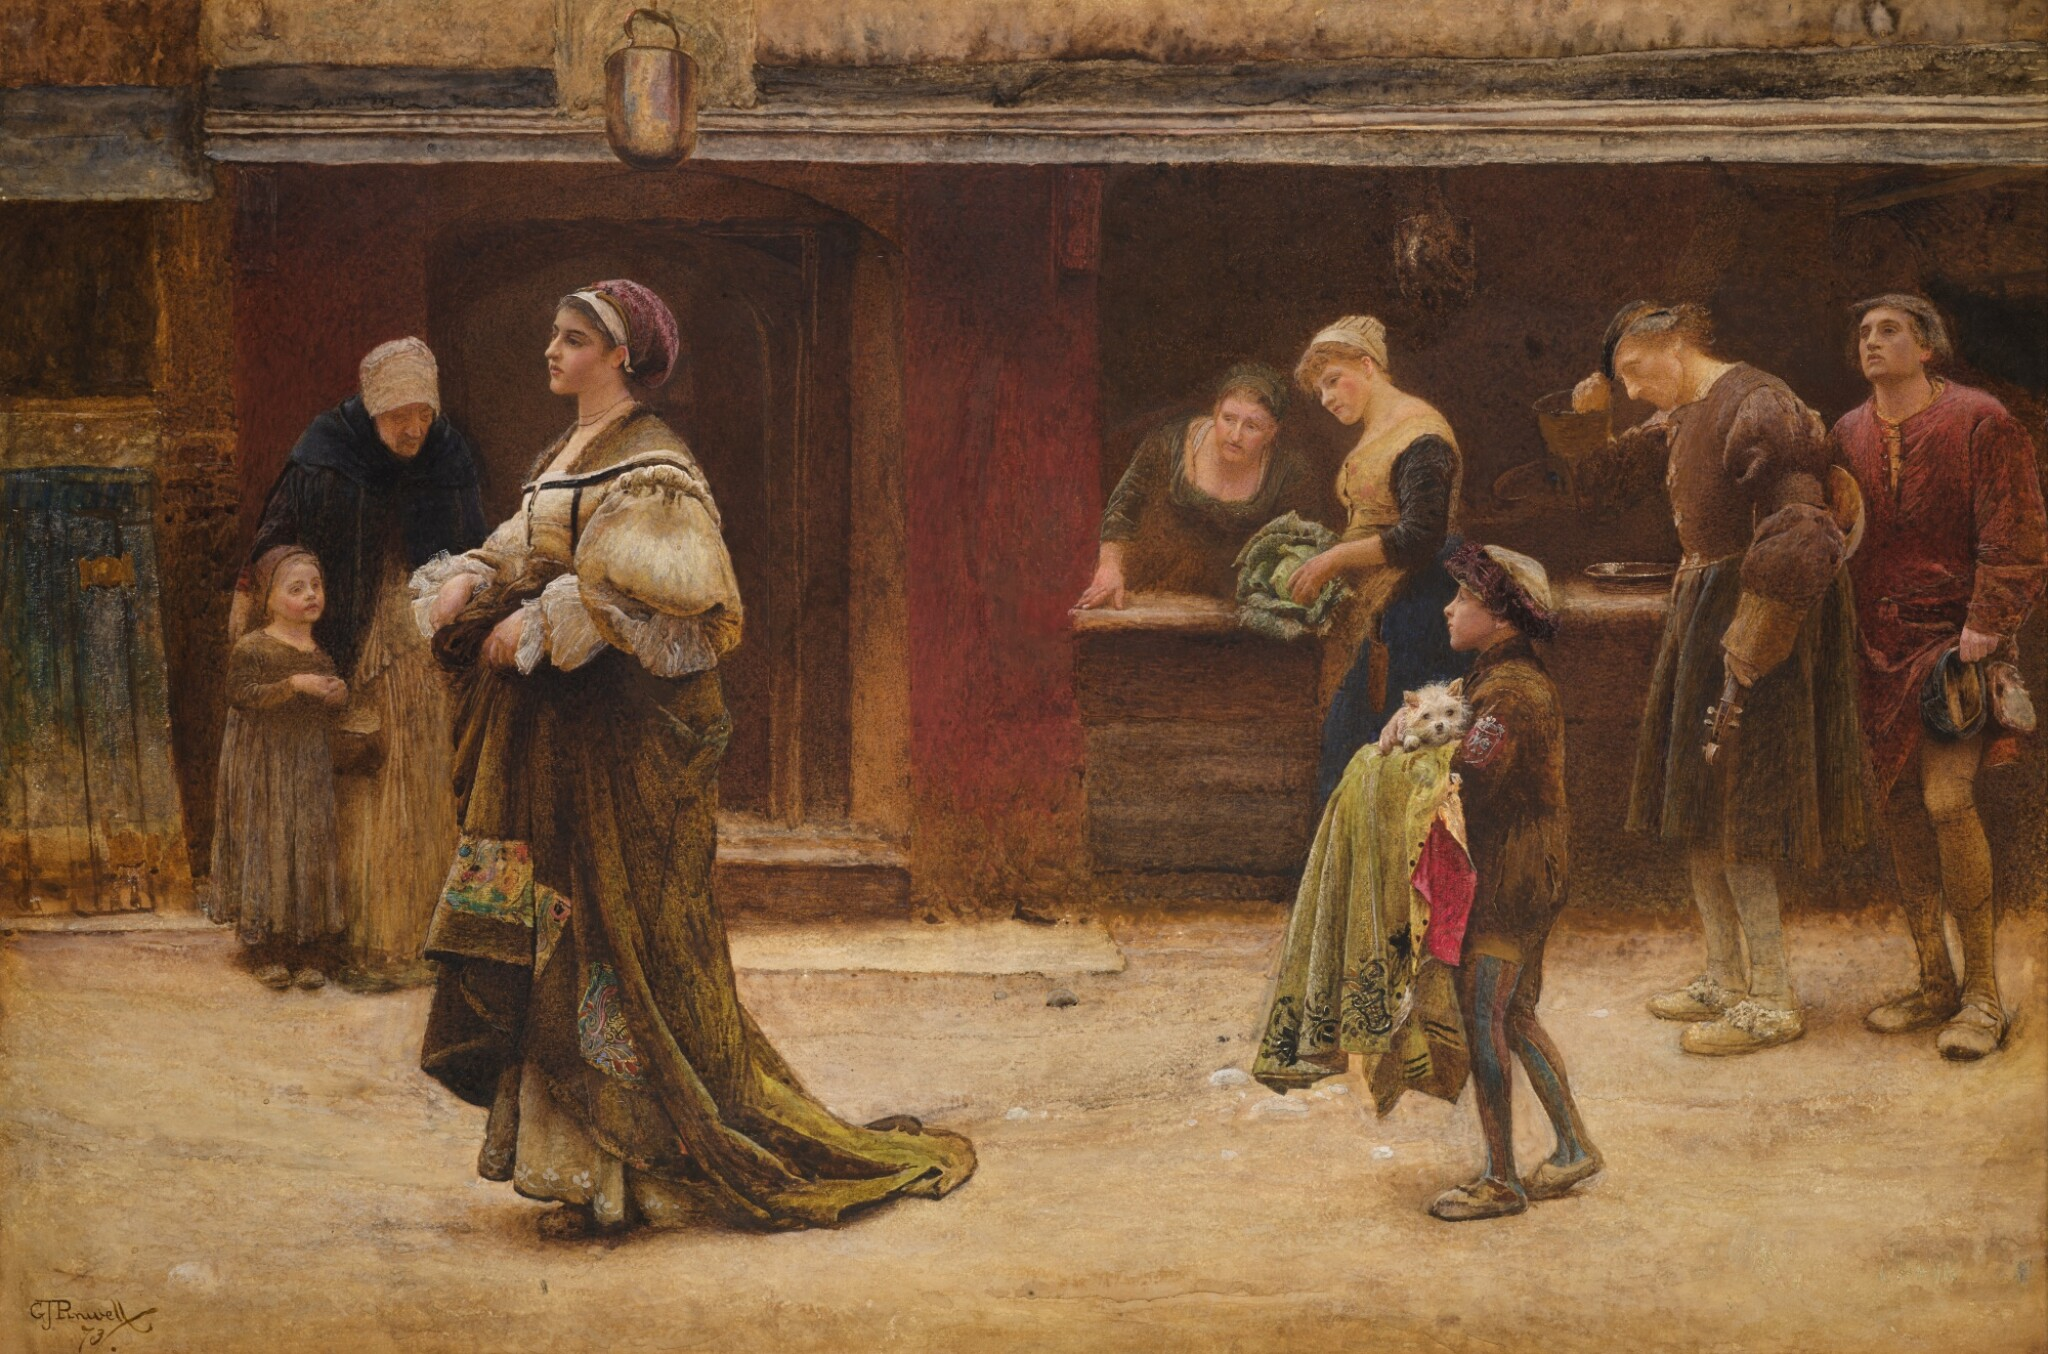 GEORGE JOHN PINWELL | THE GREAT LADY